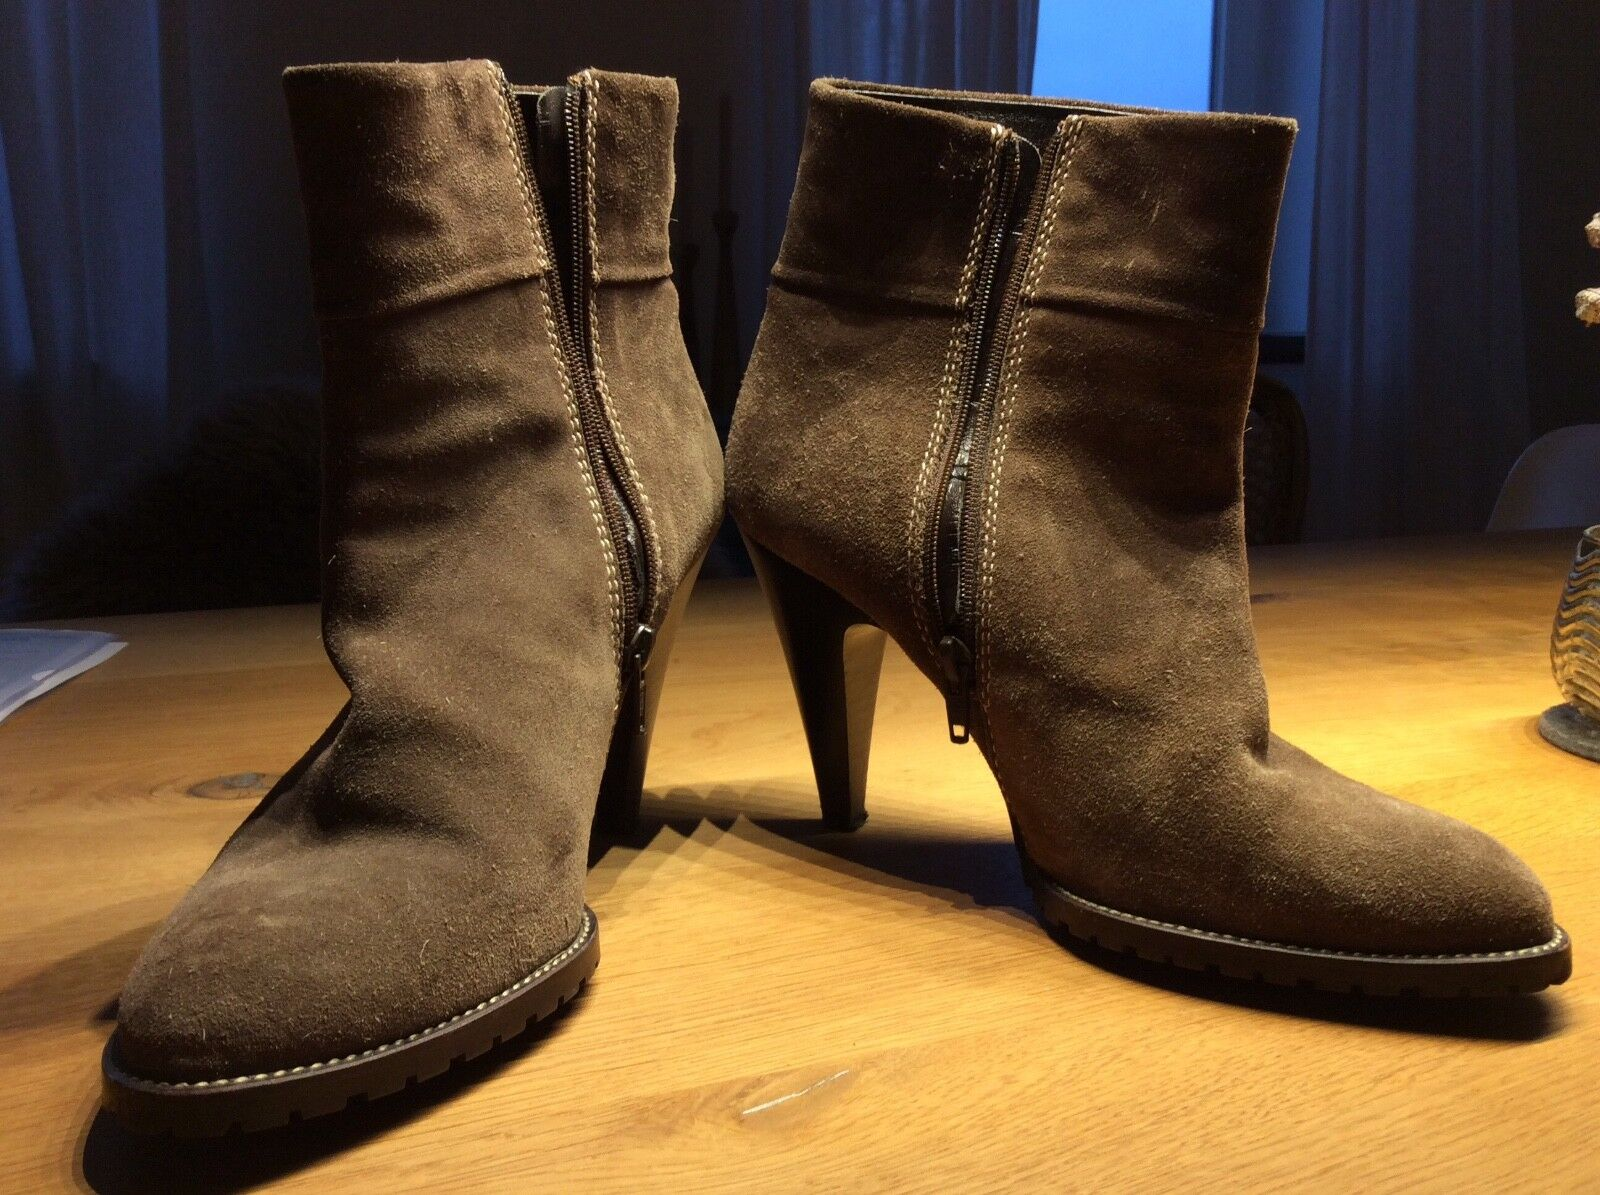 COCCINELLE Gr. Schuhe 40 Design Beige grau Damen Schuhe Gr. Stiefel Leder Schuhese 073631